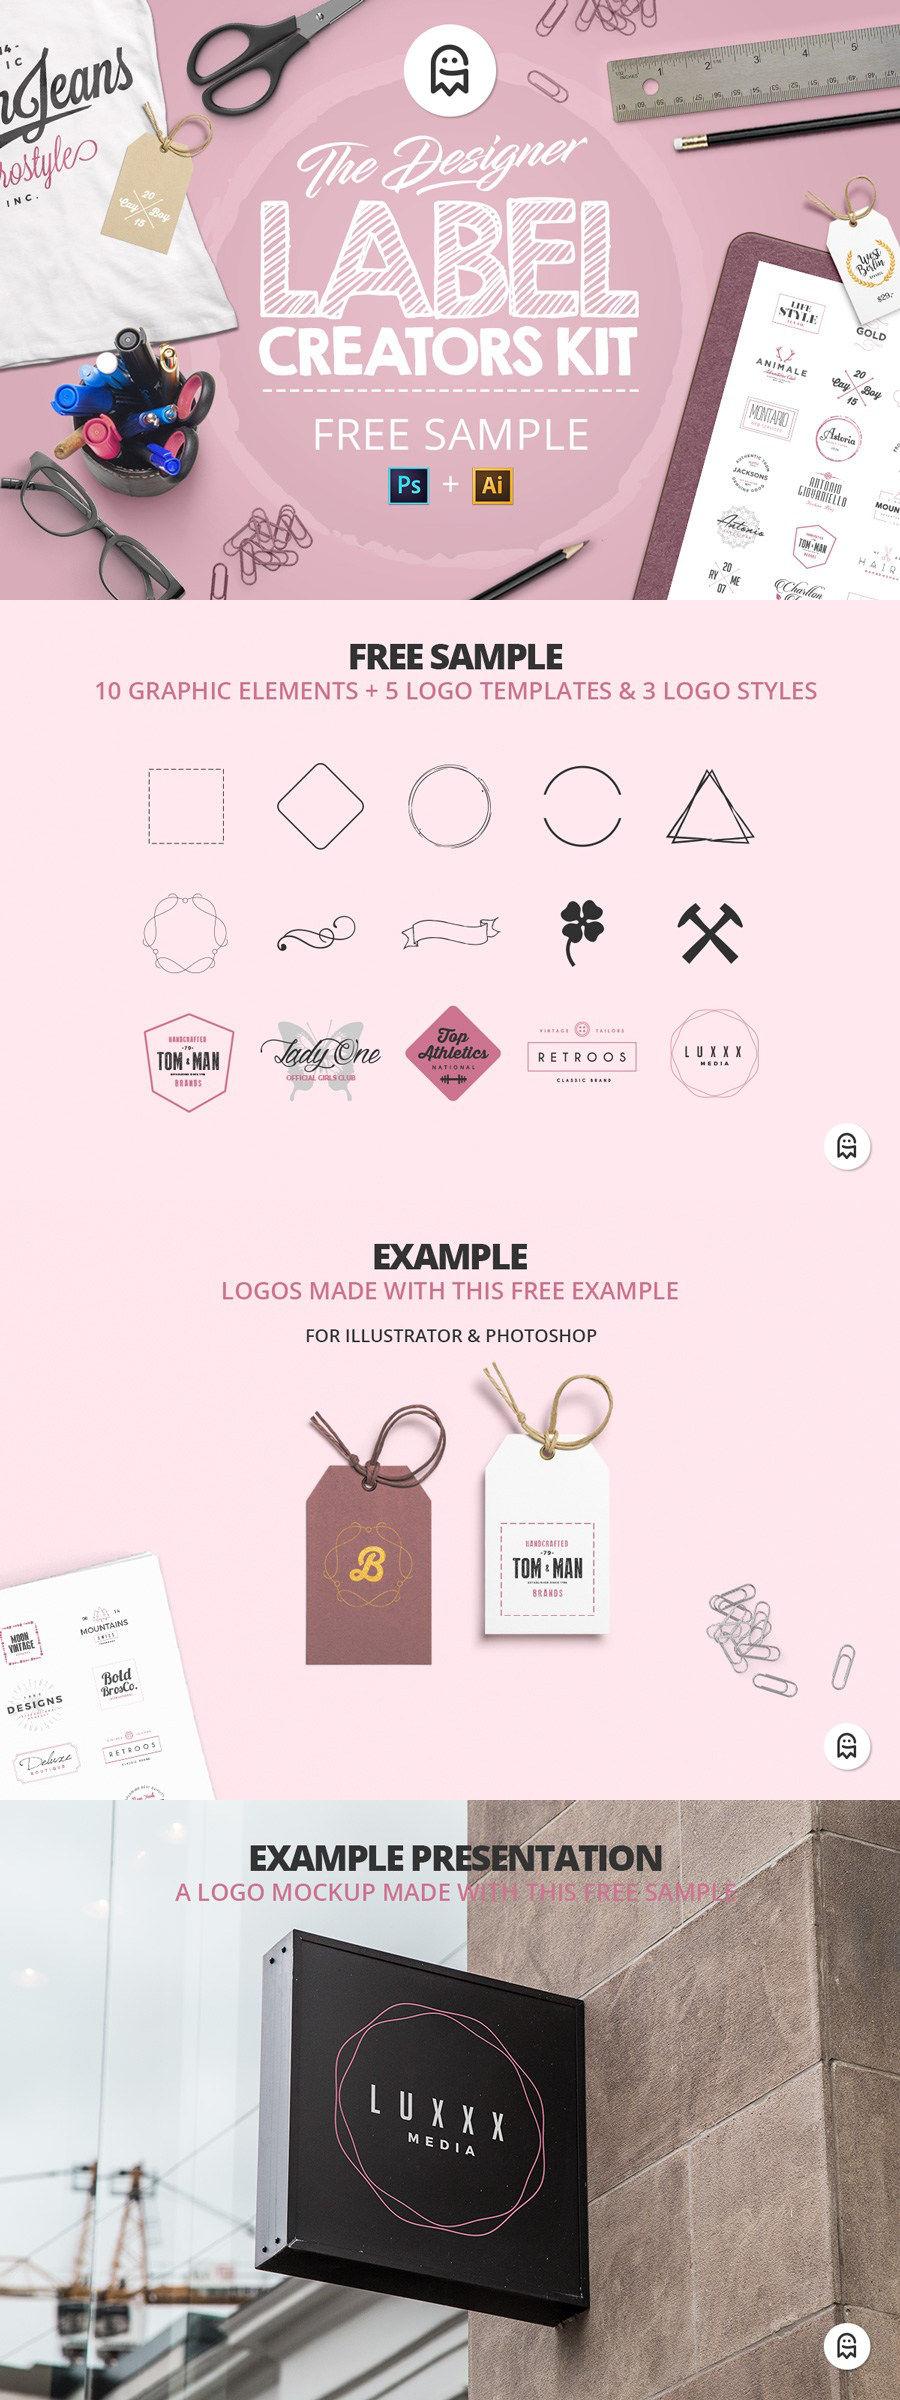 The Designer Label Creators Kit - Free Sample